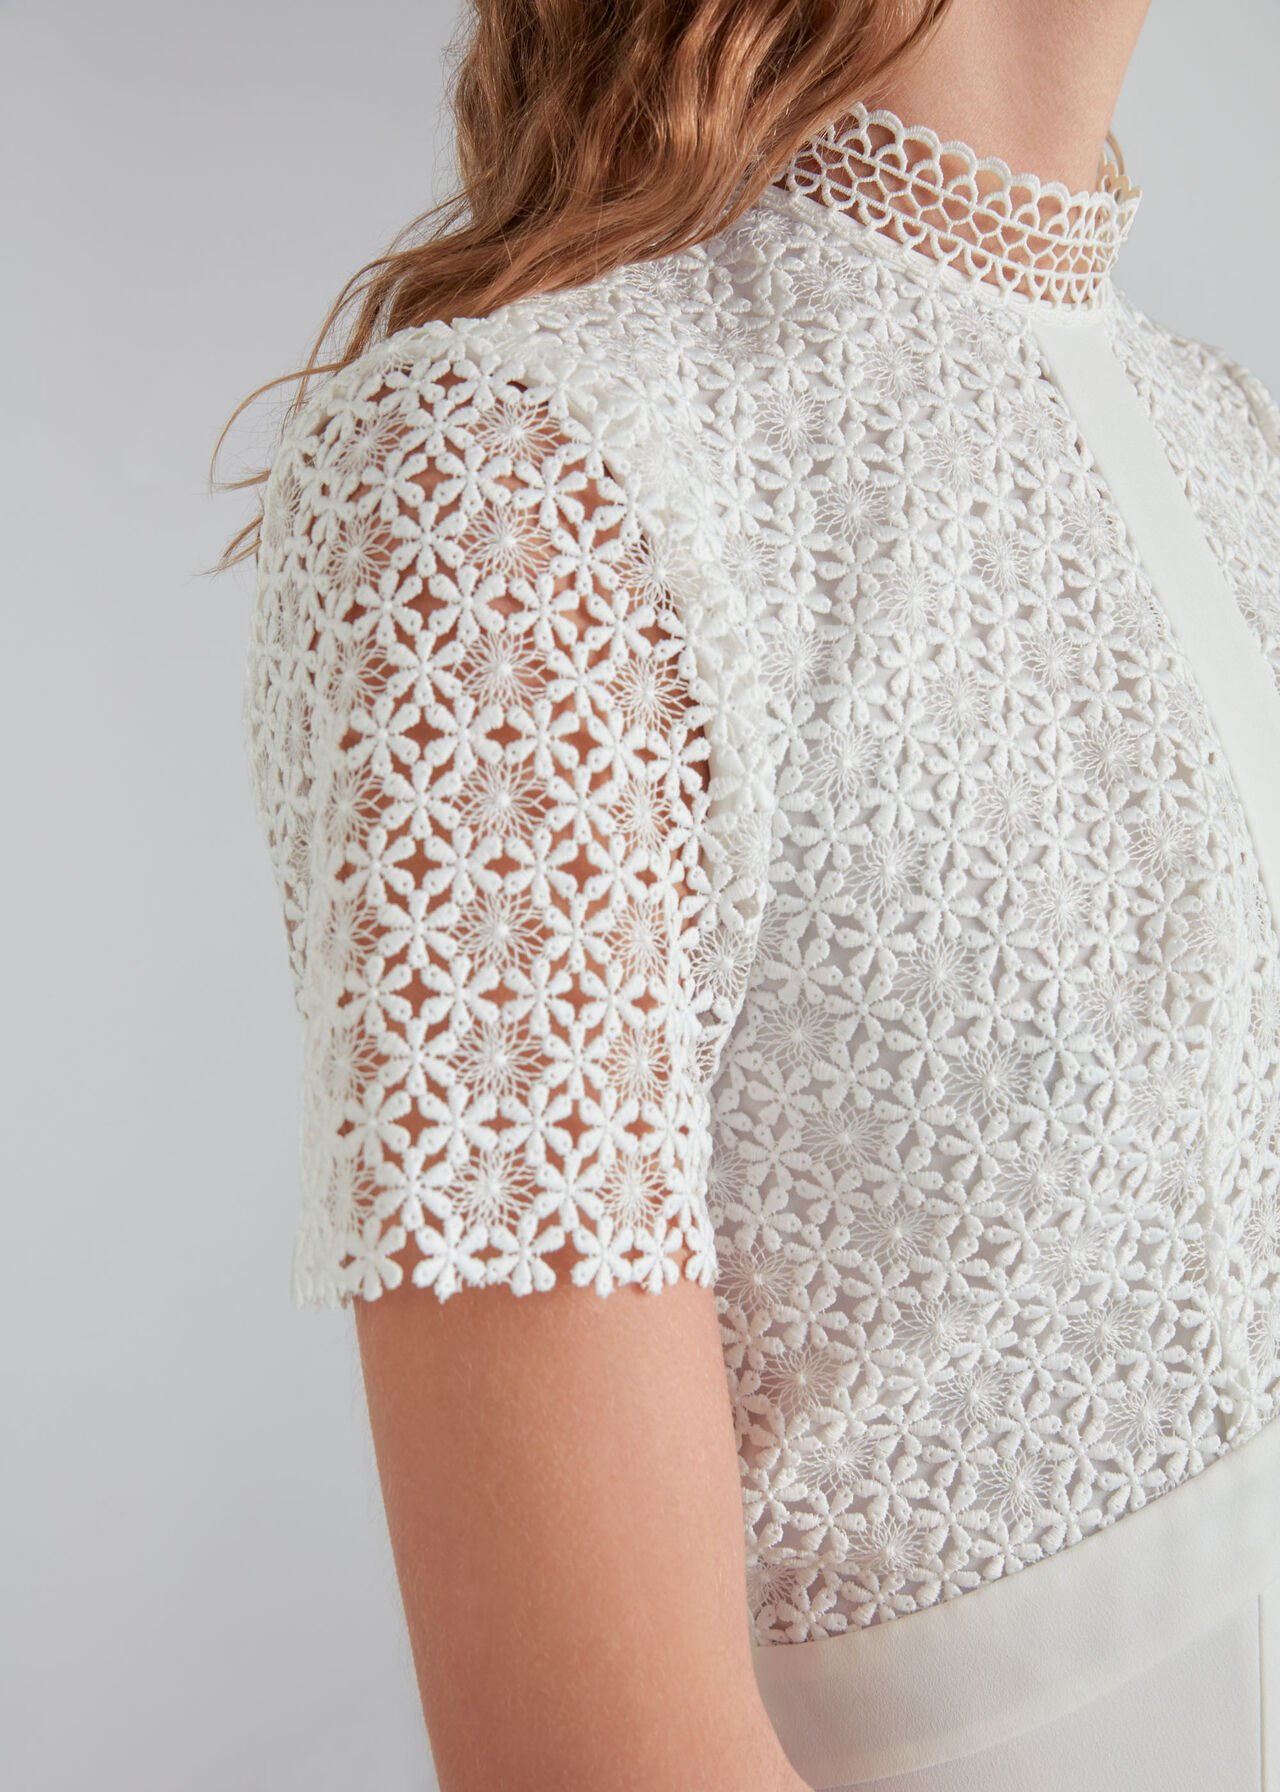 Scarlett Wedding Dress